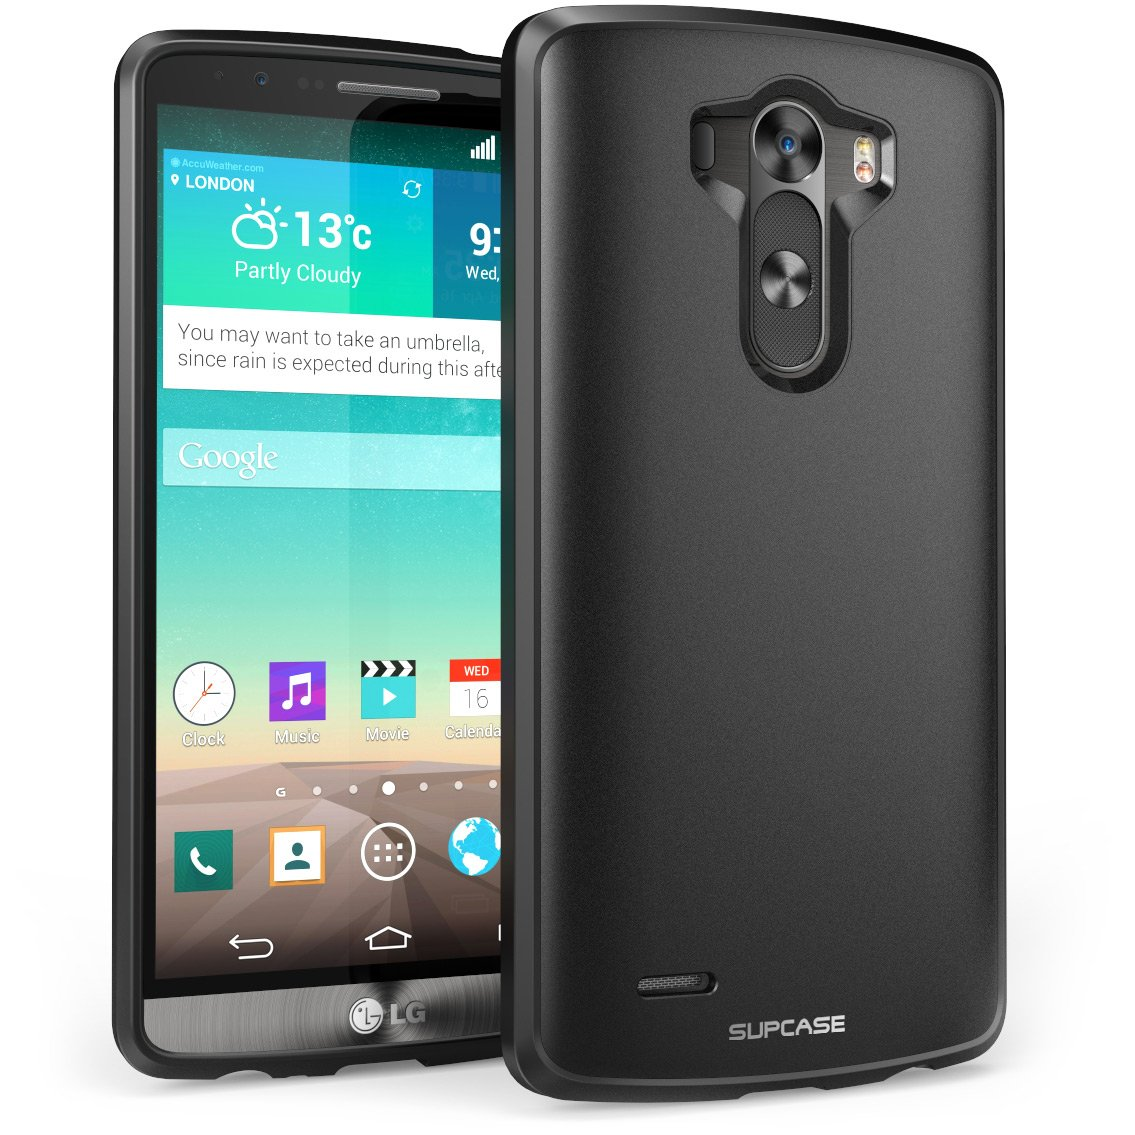 SupCase Unicorn Beetle Premium Hybrid Protective Case for LG G3